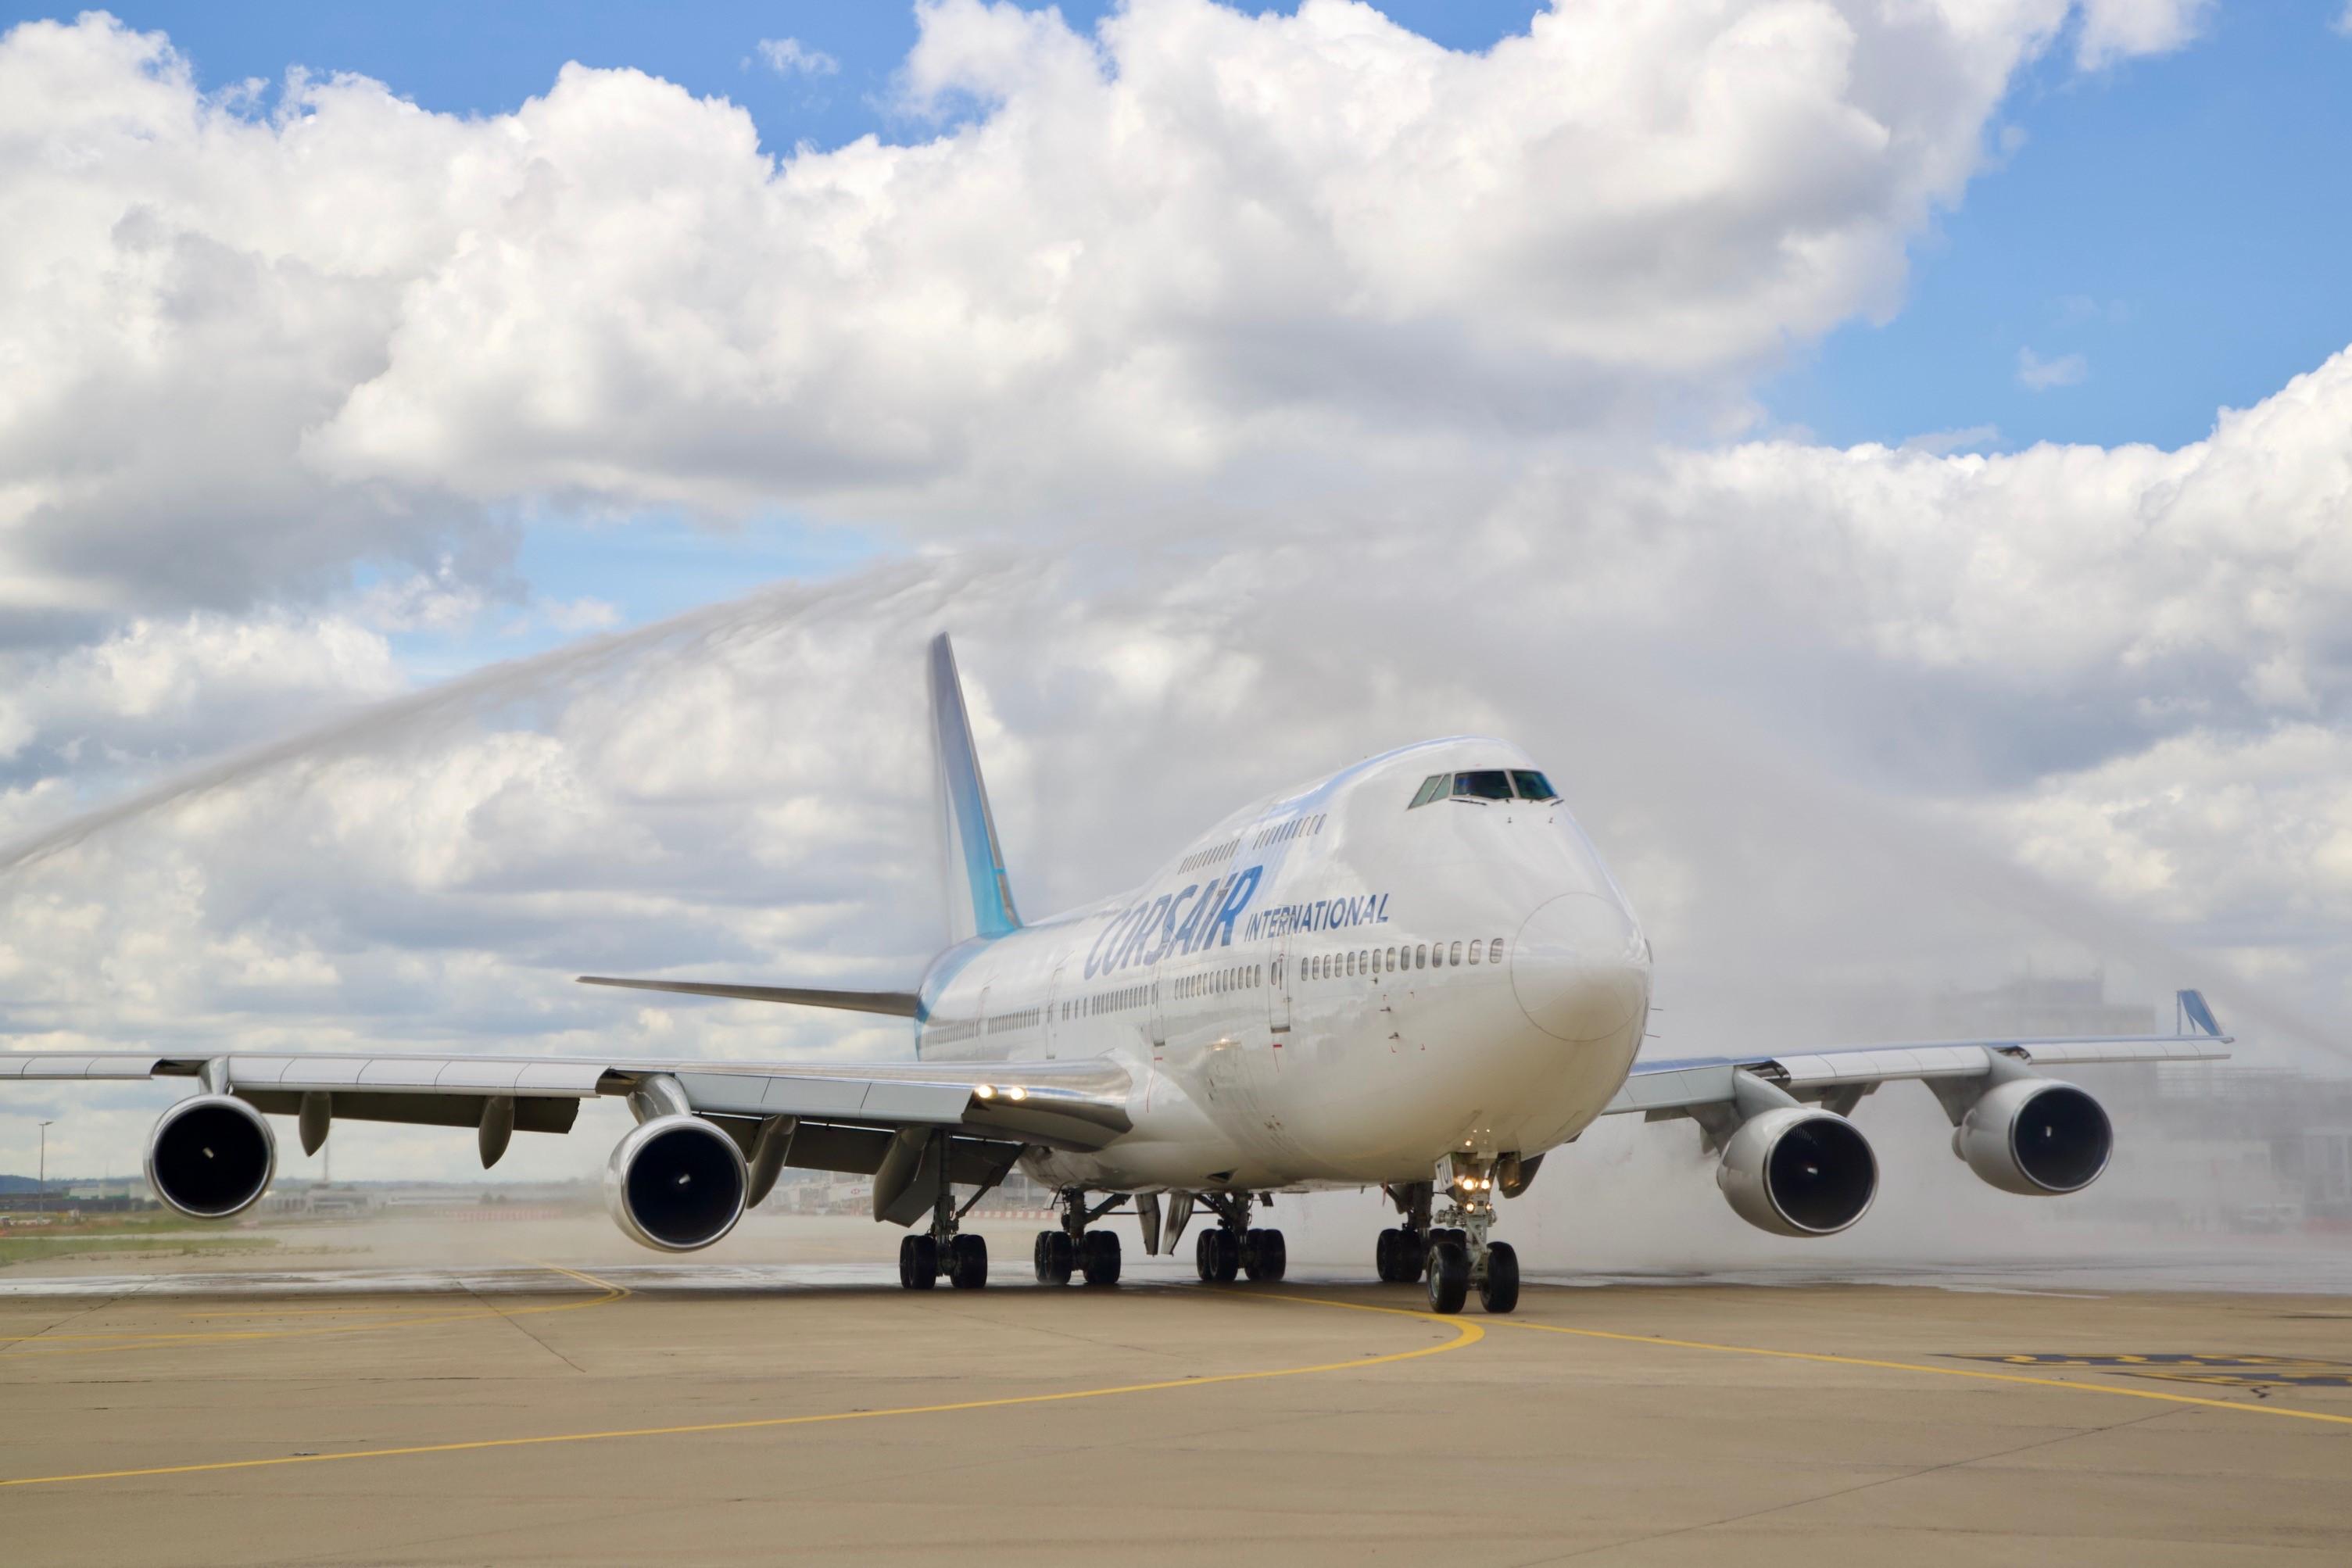 小松空港発着の仁川、上海、台北線、7月31日まで全便運休